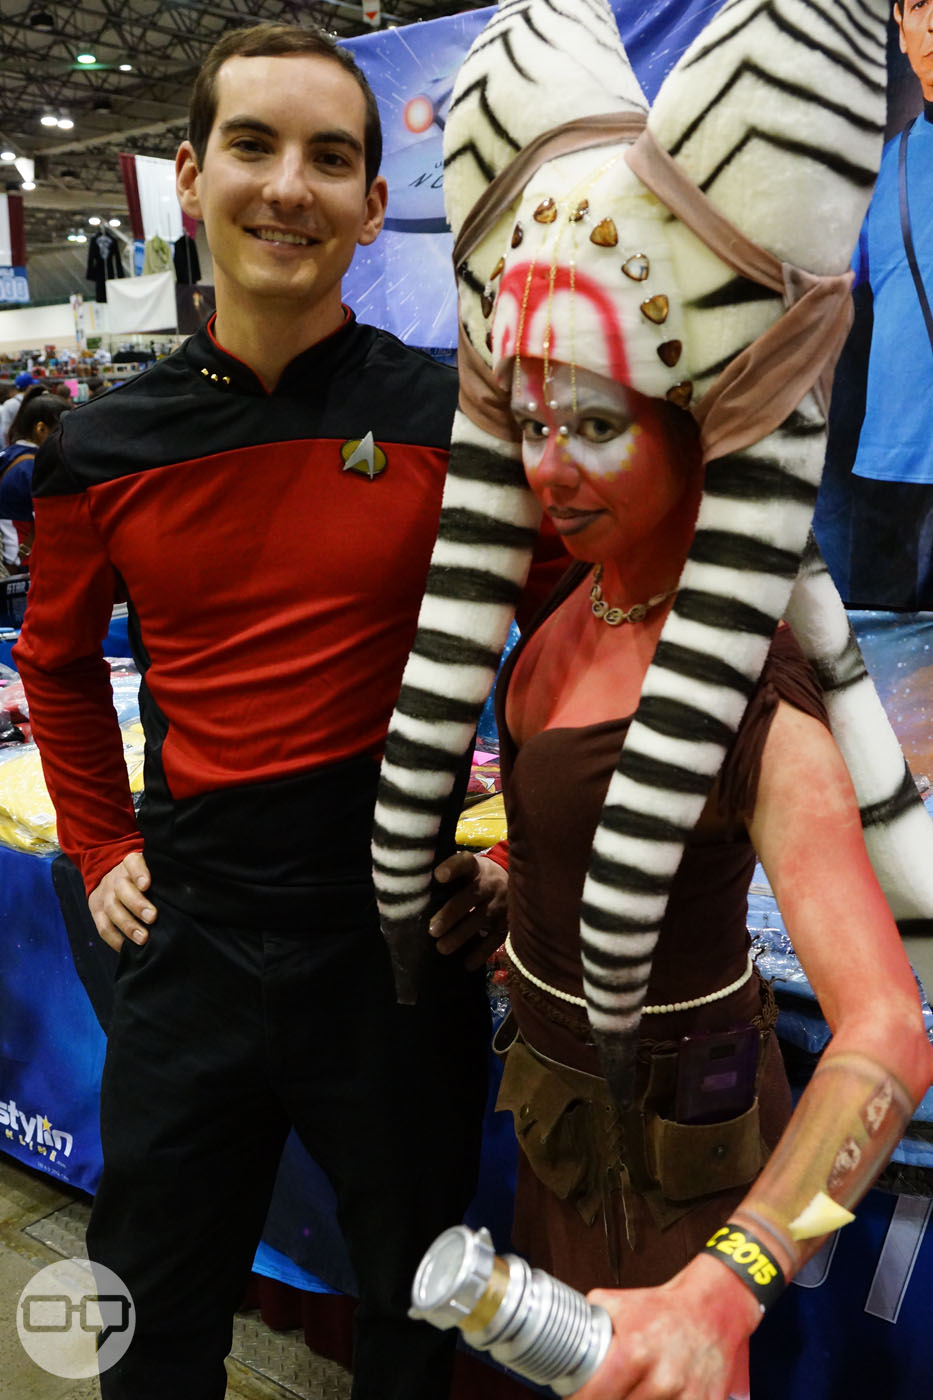 Planet-Comicon-2015-ProNerd-Cosplay-D4-9